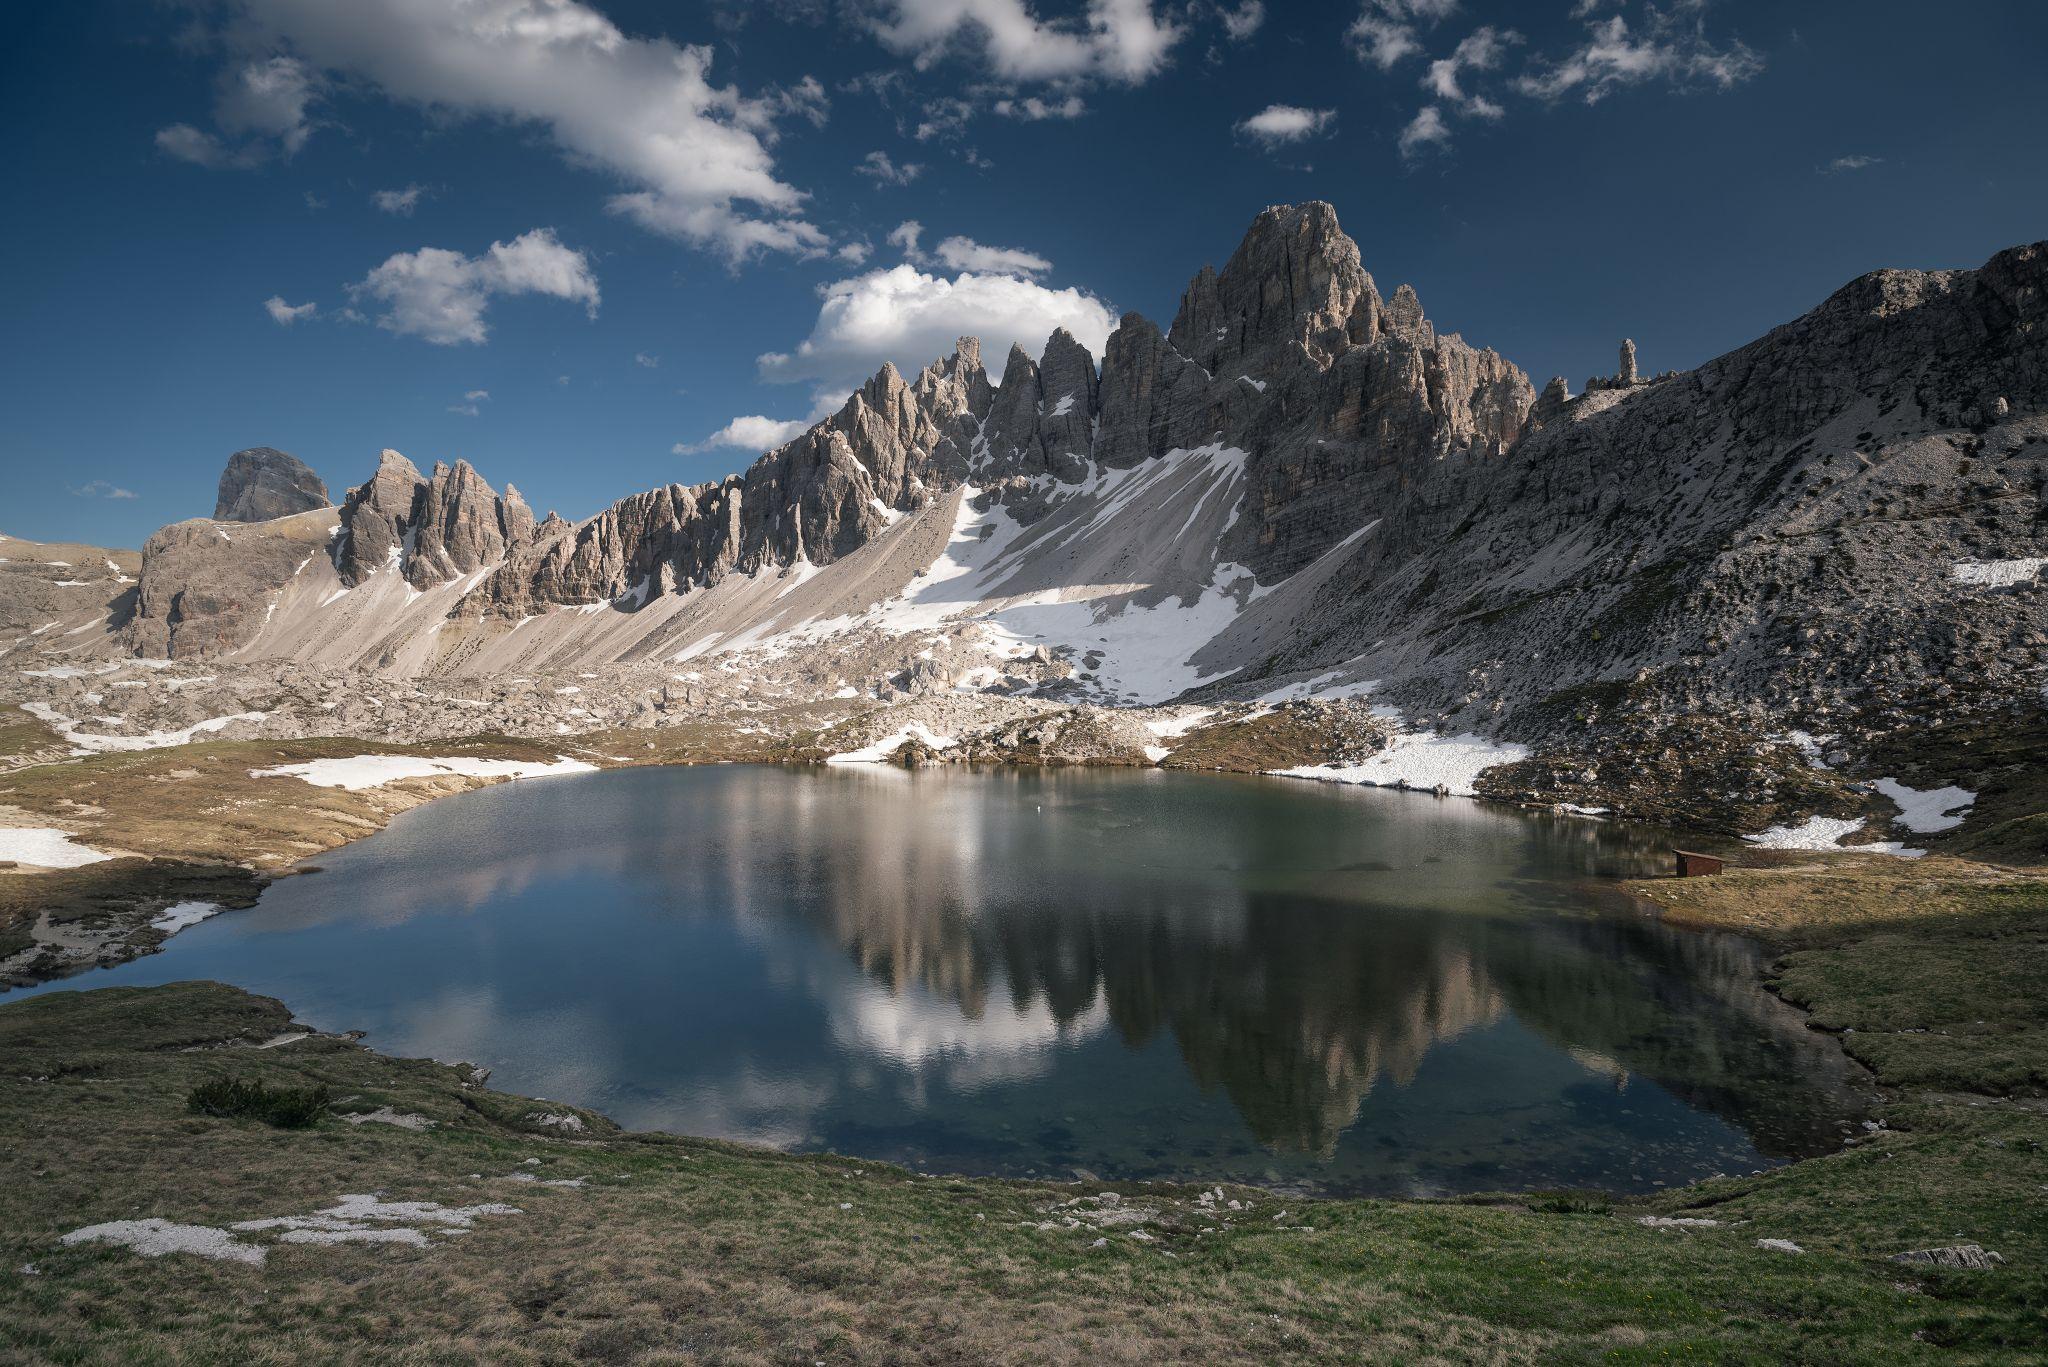 Monte Paterno, Italy